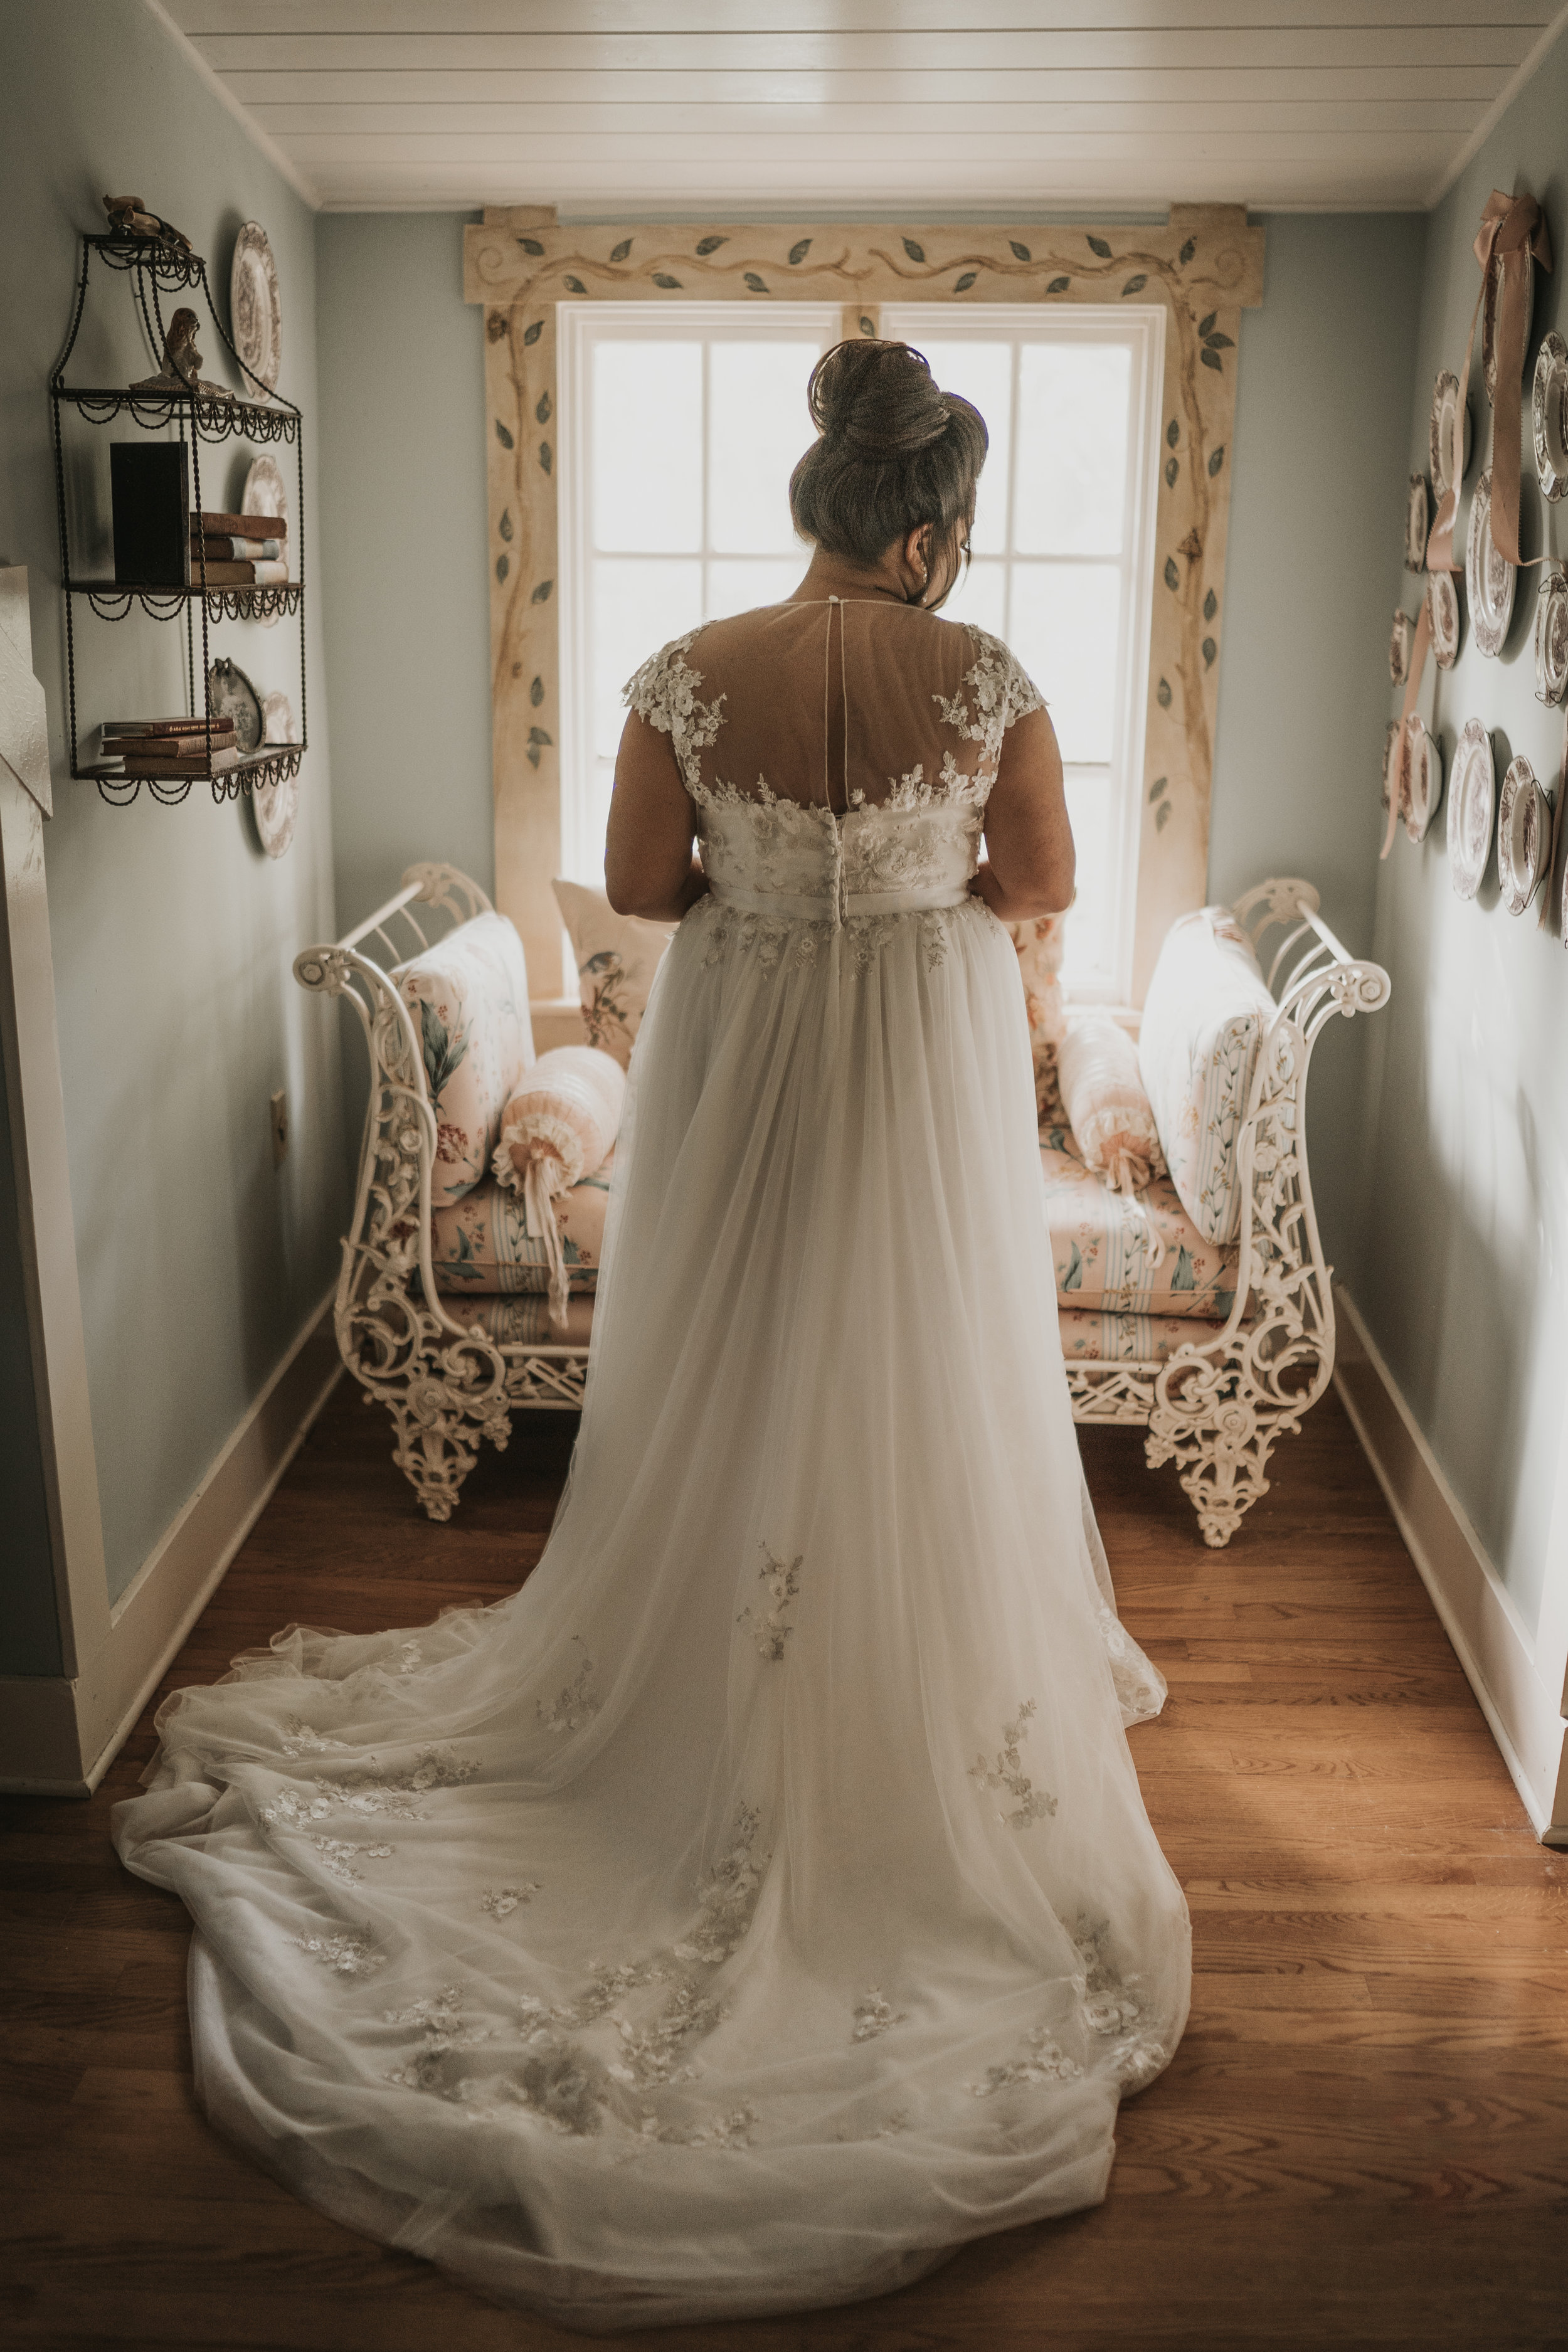 194MICHI&GABEWEDDINGDAY(WeddingFinal).jpg